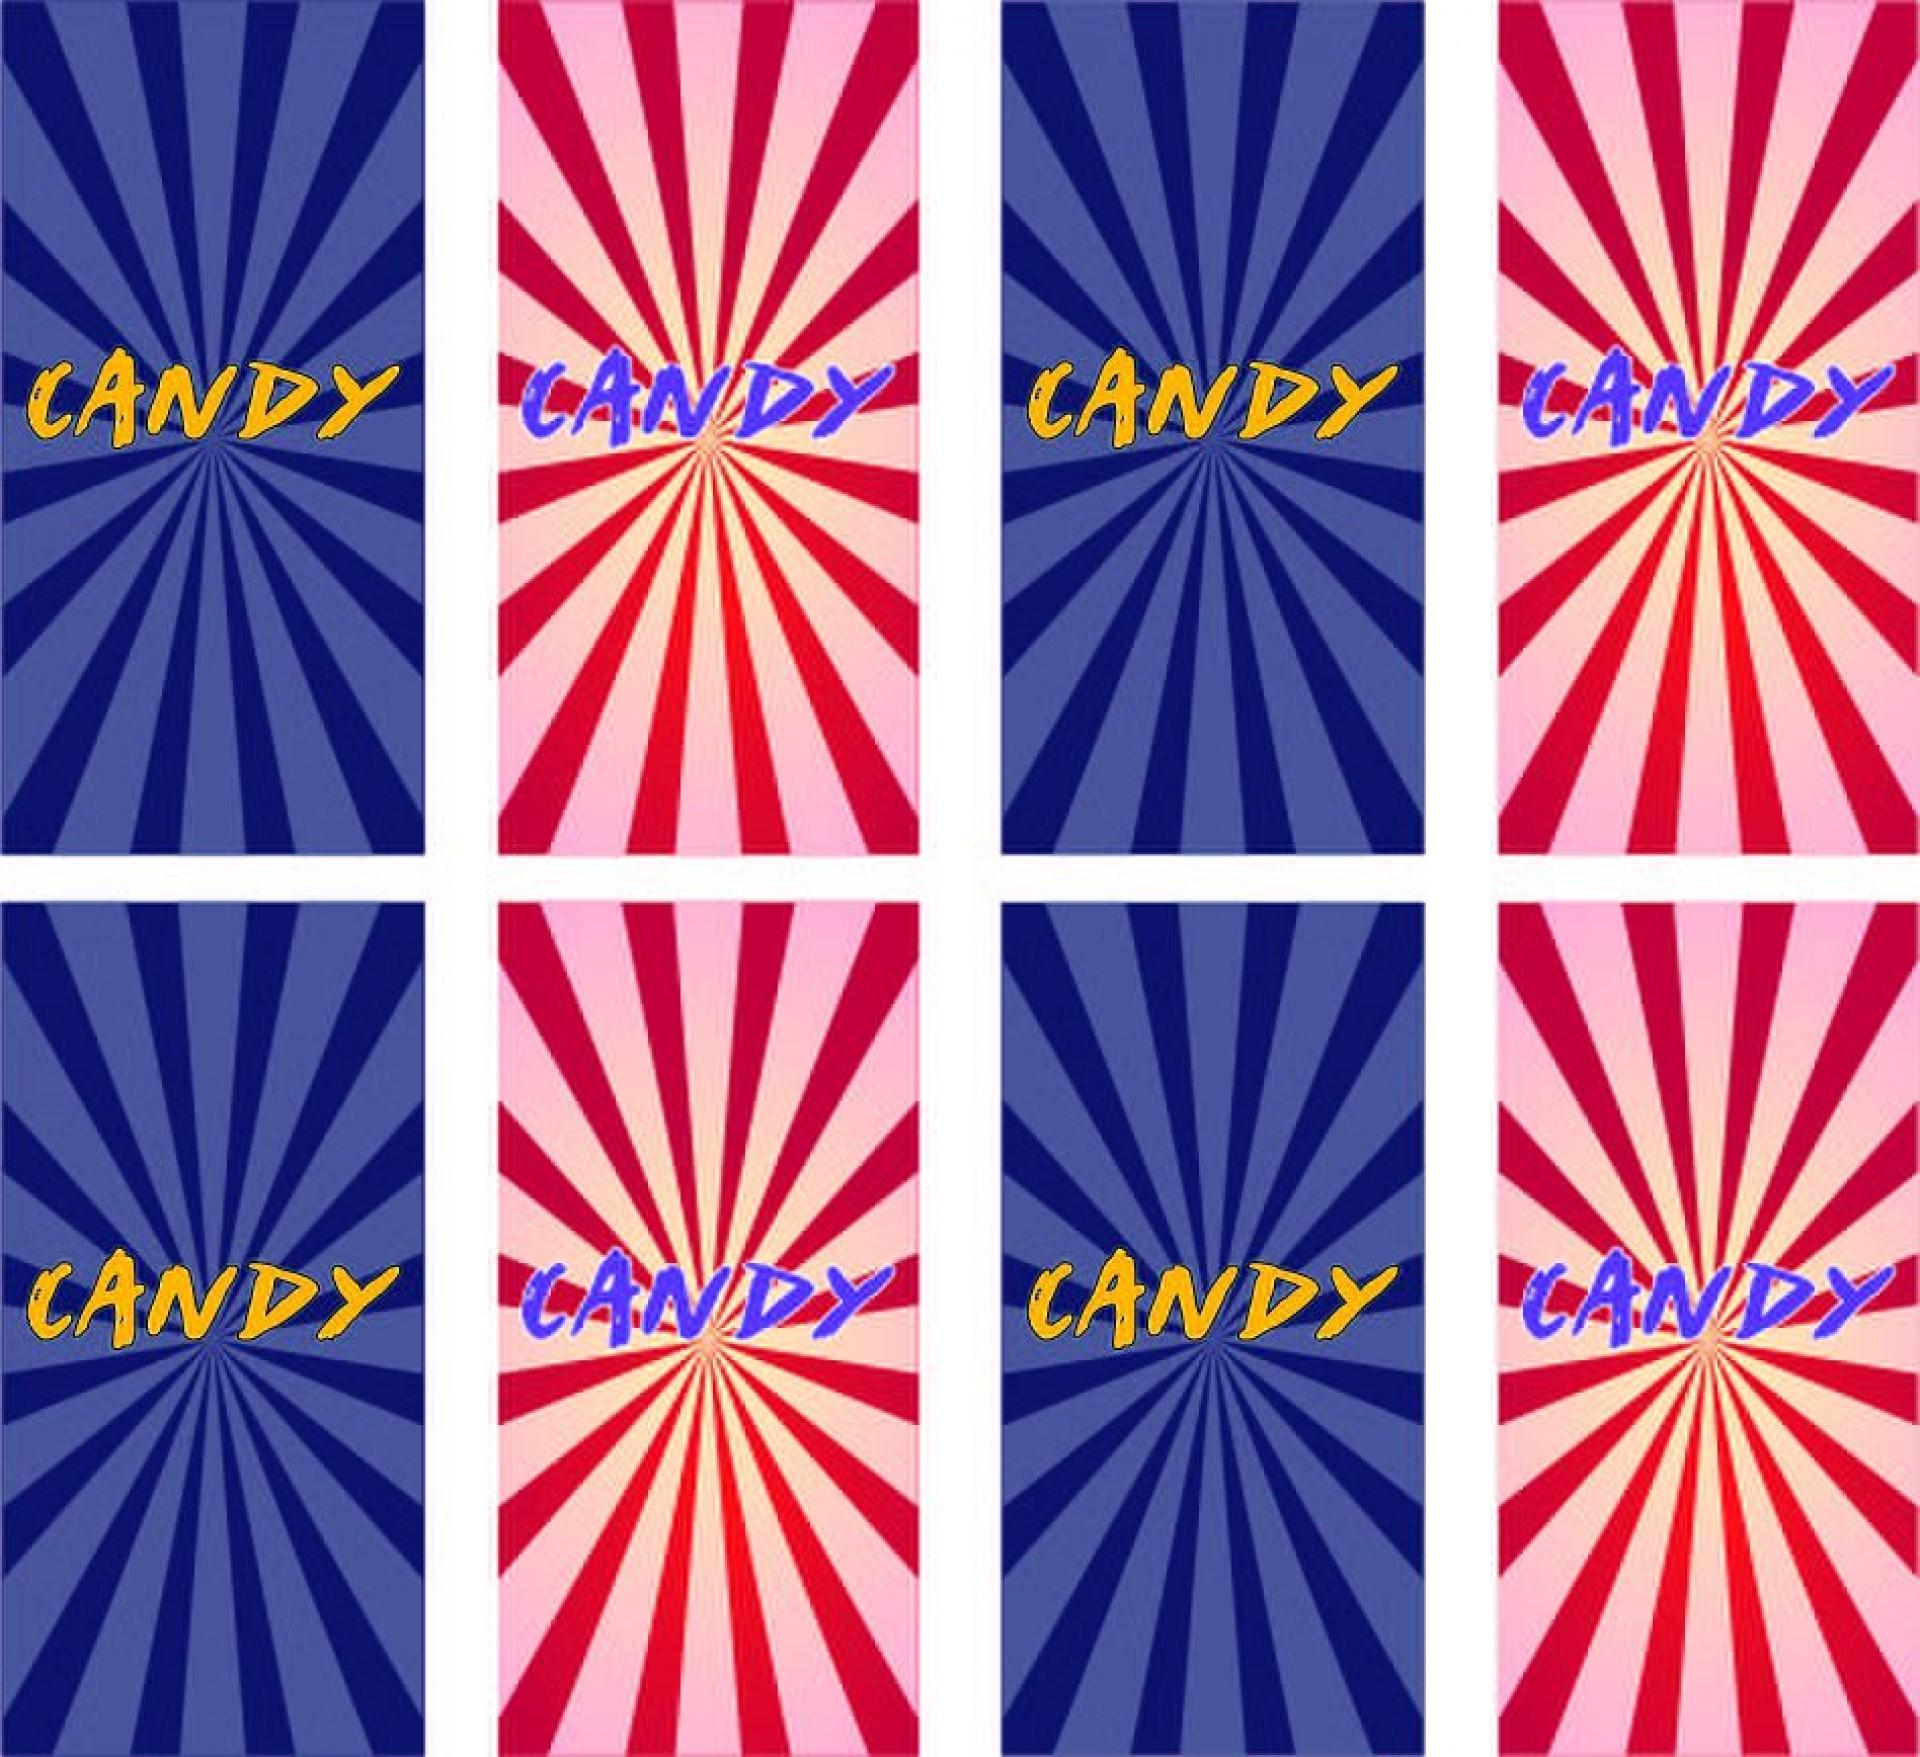 008 Stunning Graduation Candy Bar Wrapper Template Word Highest Clarity 1920